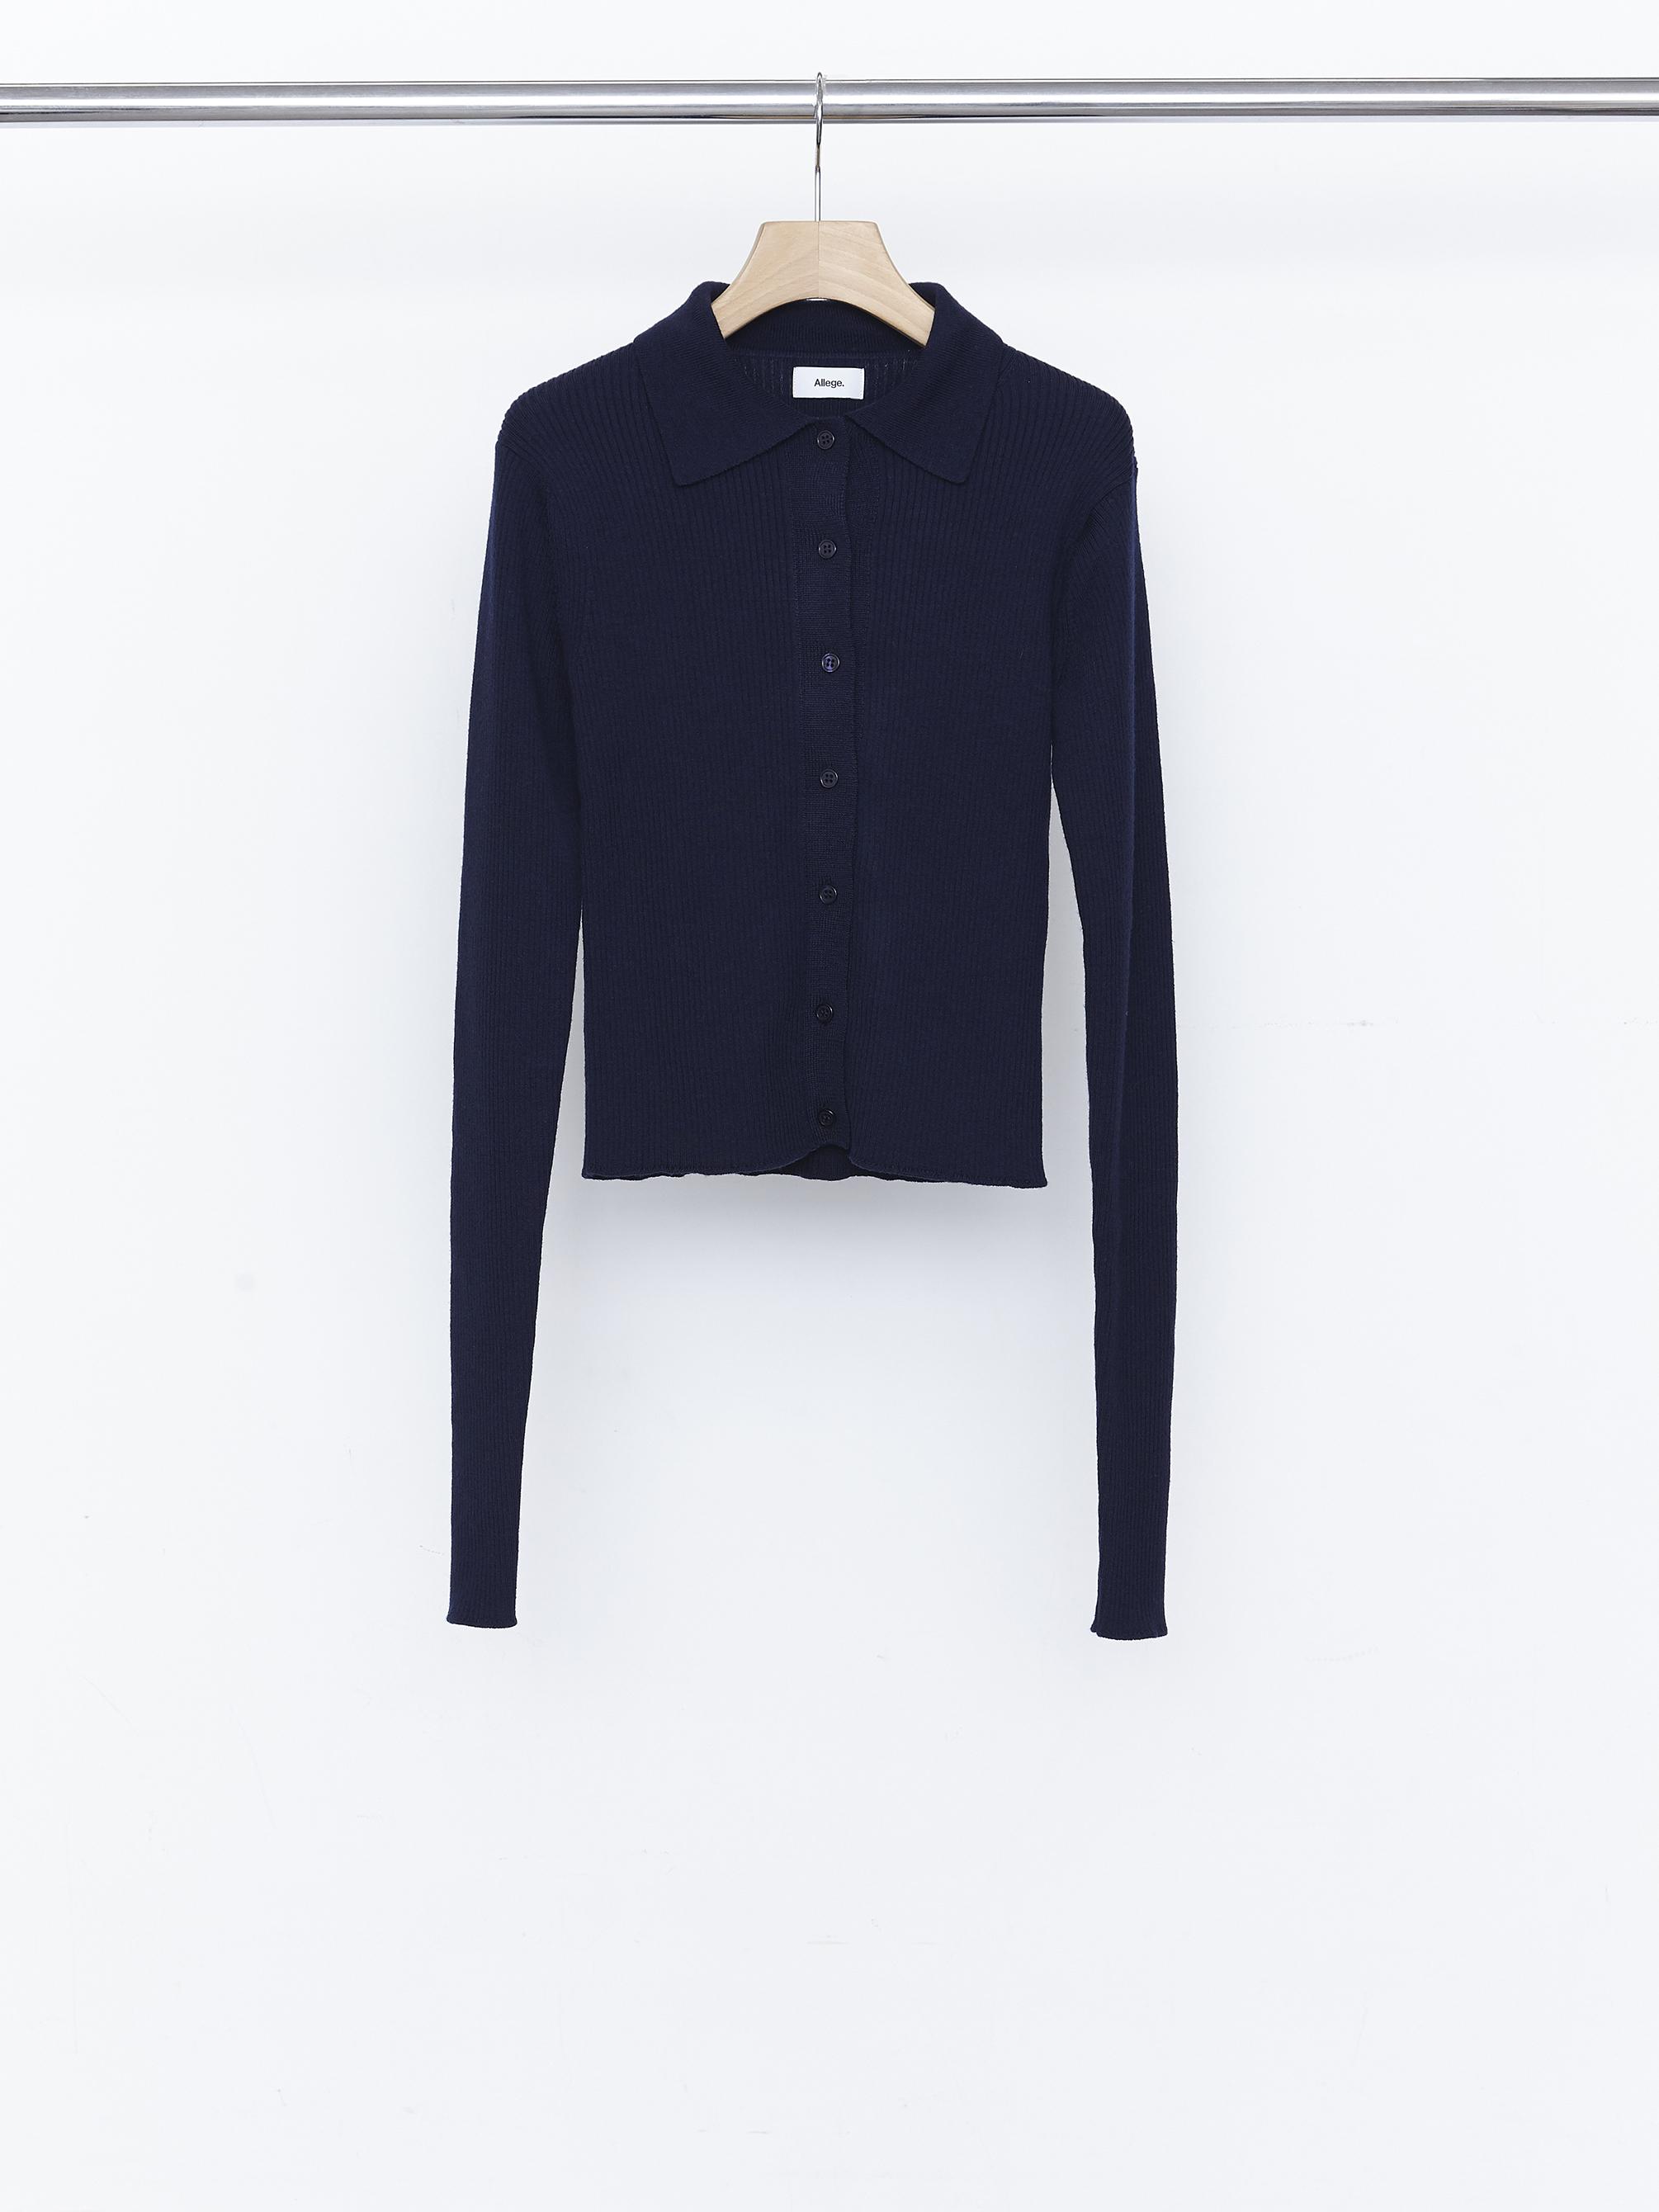 Standard Wool Rib Cardigan - Navy